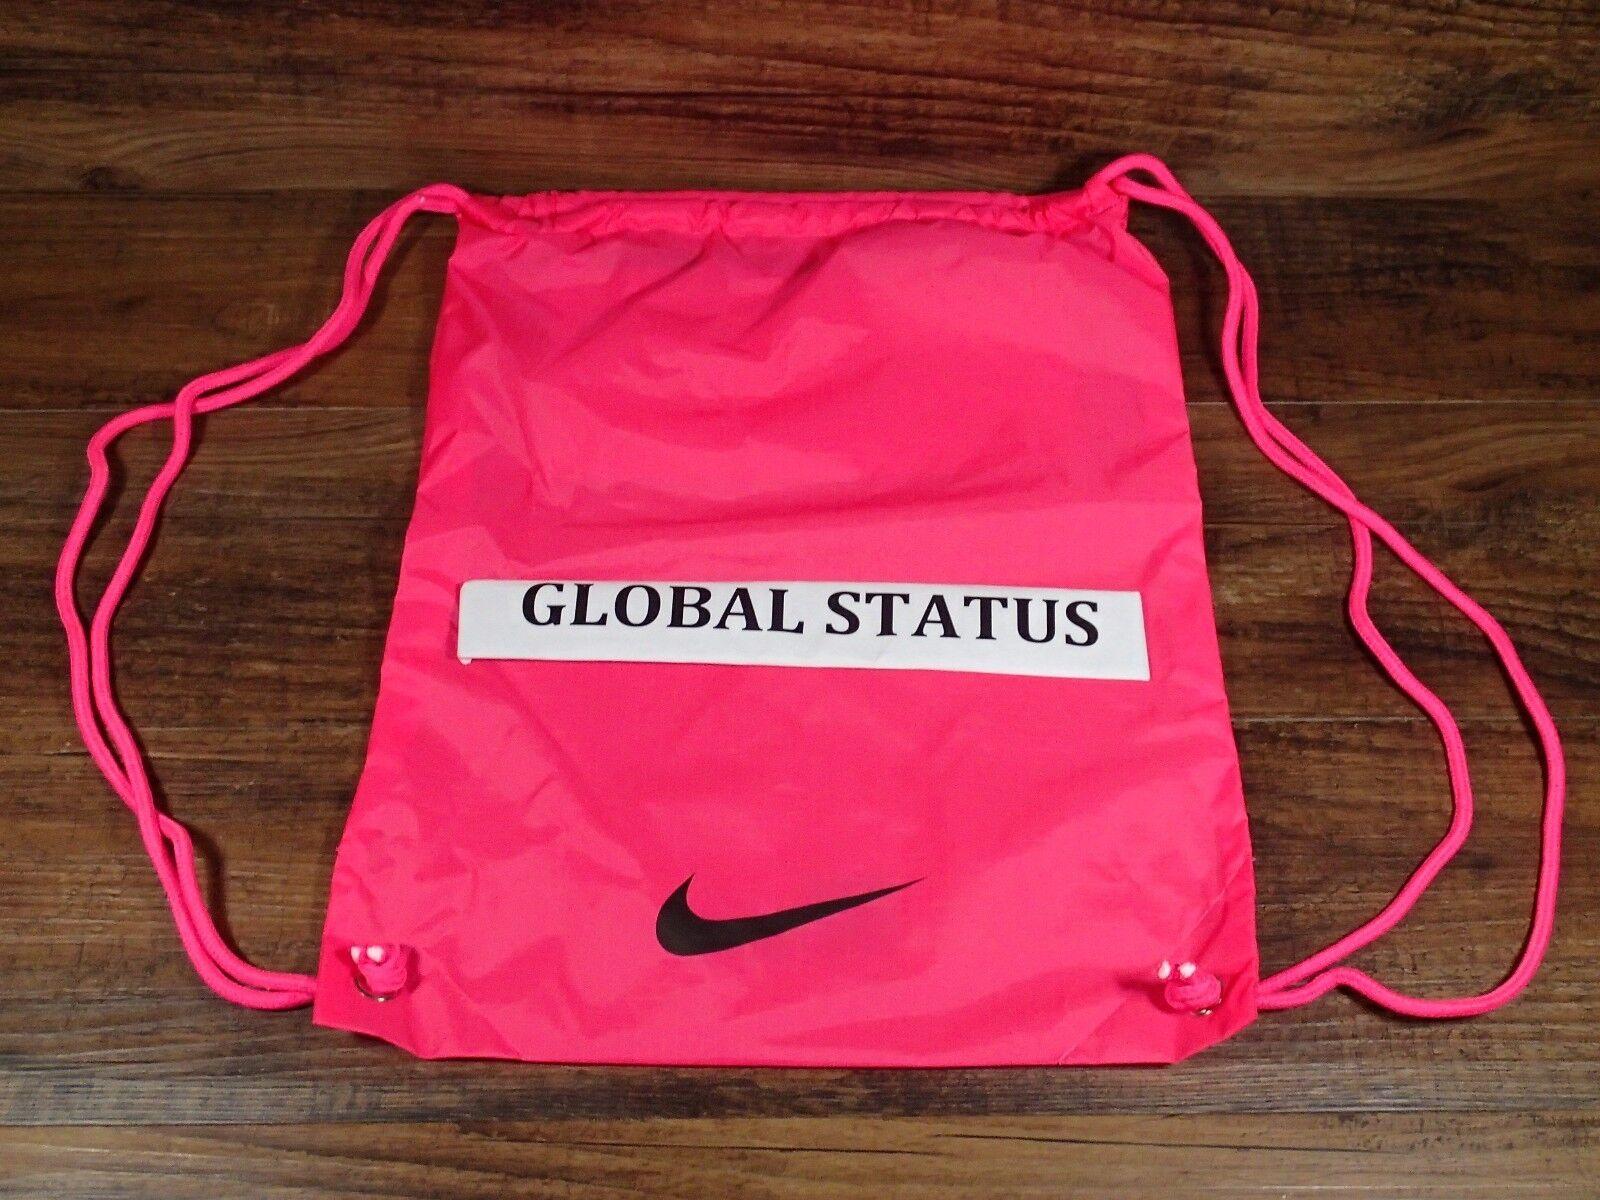 Nike mercurial vapor - x - - fg - - mens rosa schwarze stollenschuhe 648553 660. aefa69